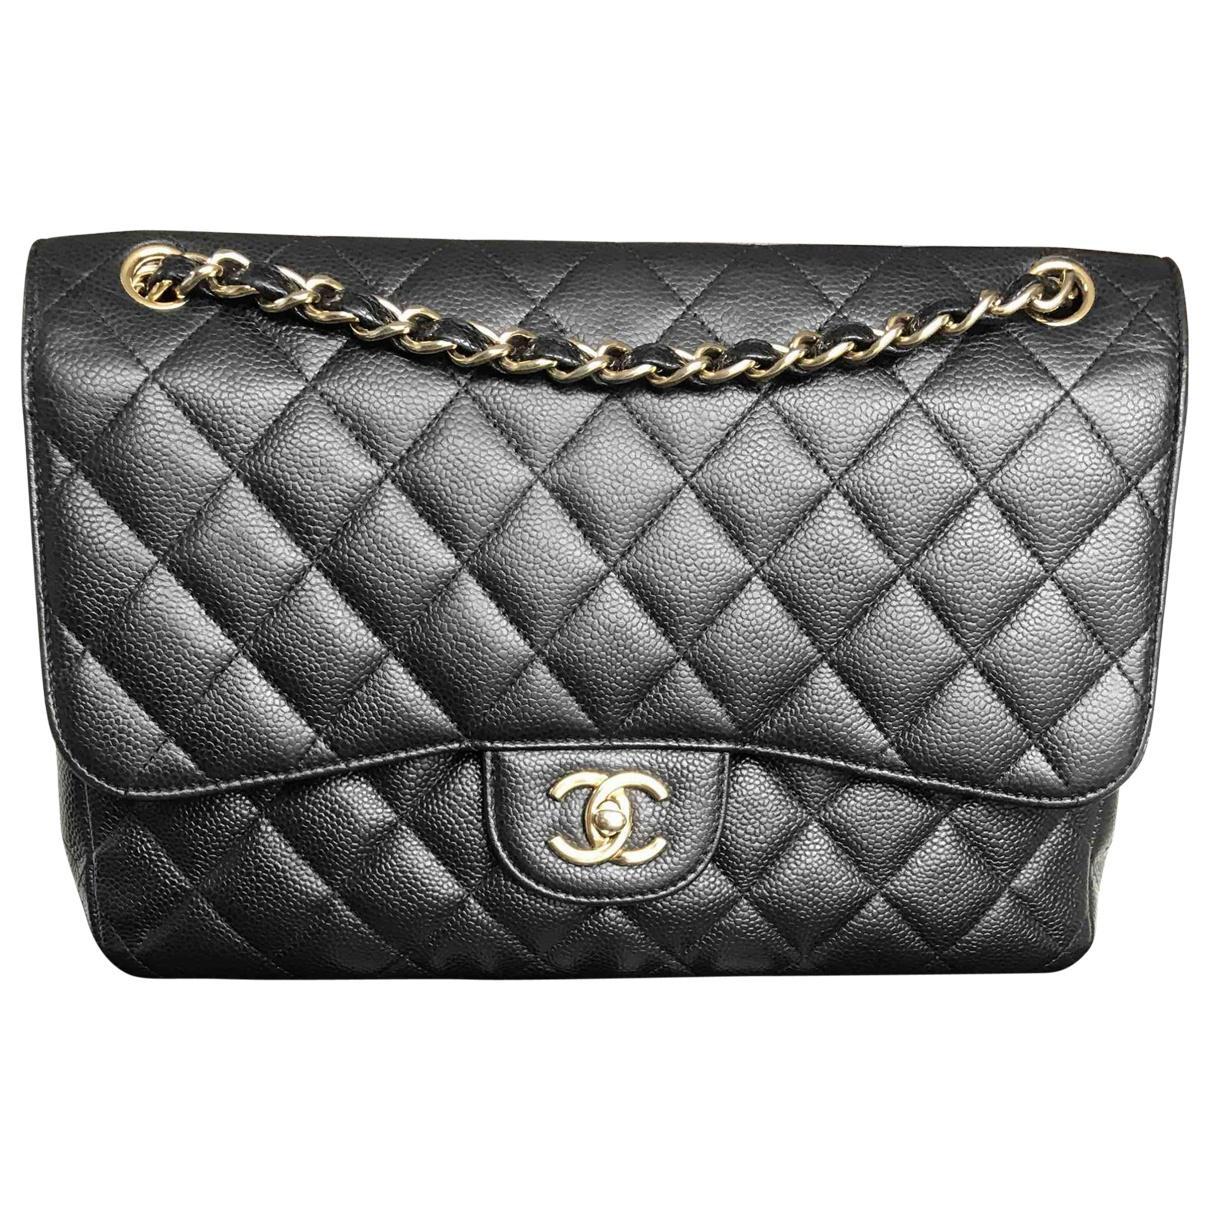 Chanel Pre-owned - Timeless crossbody bag Xok5Fik